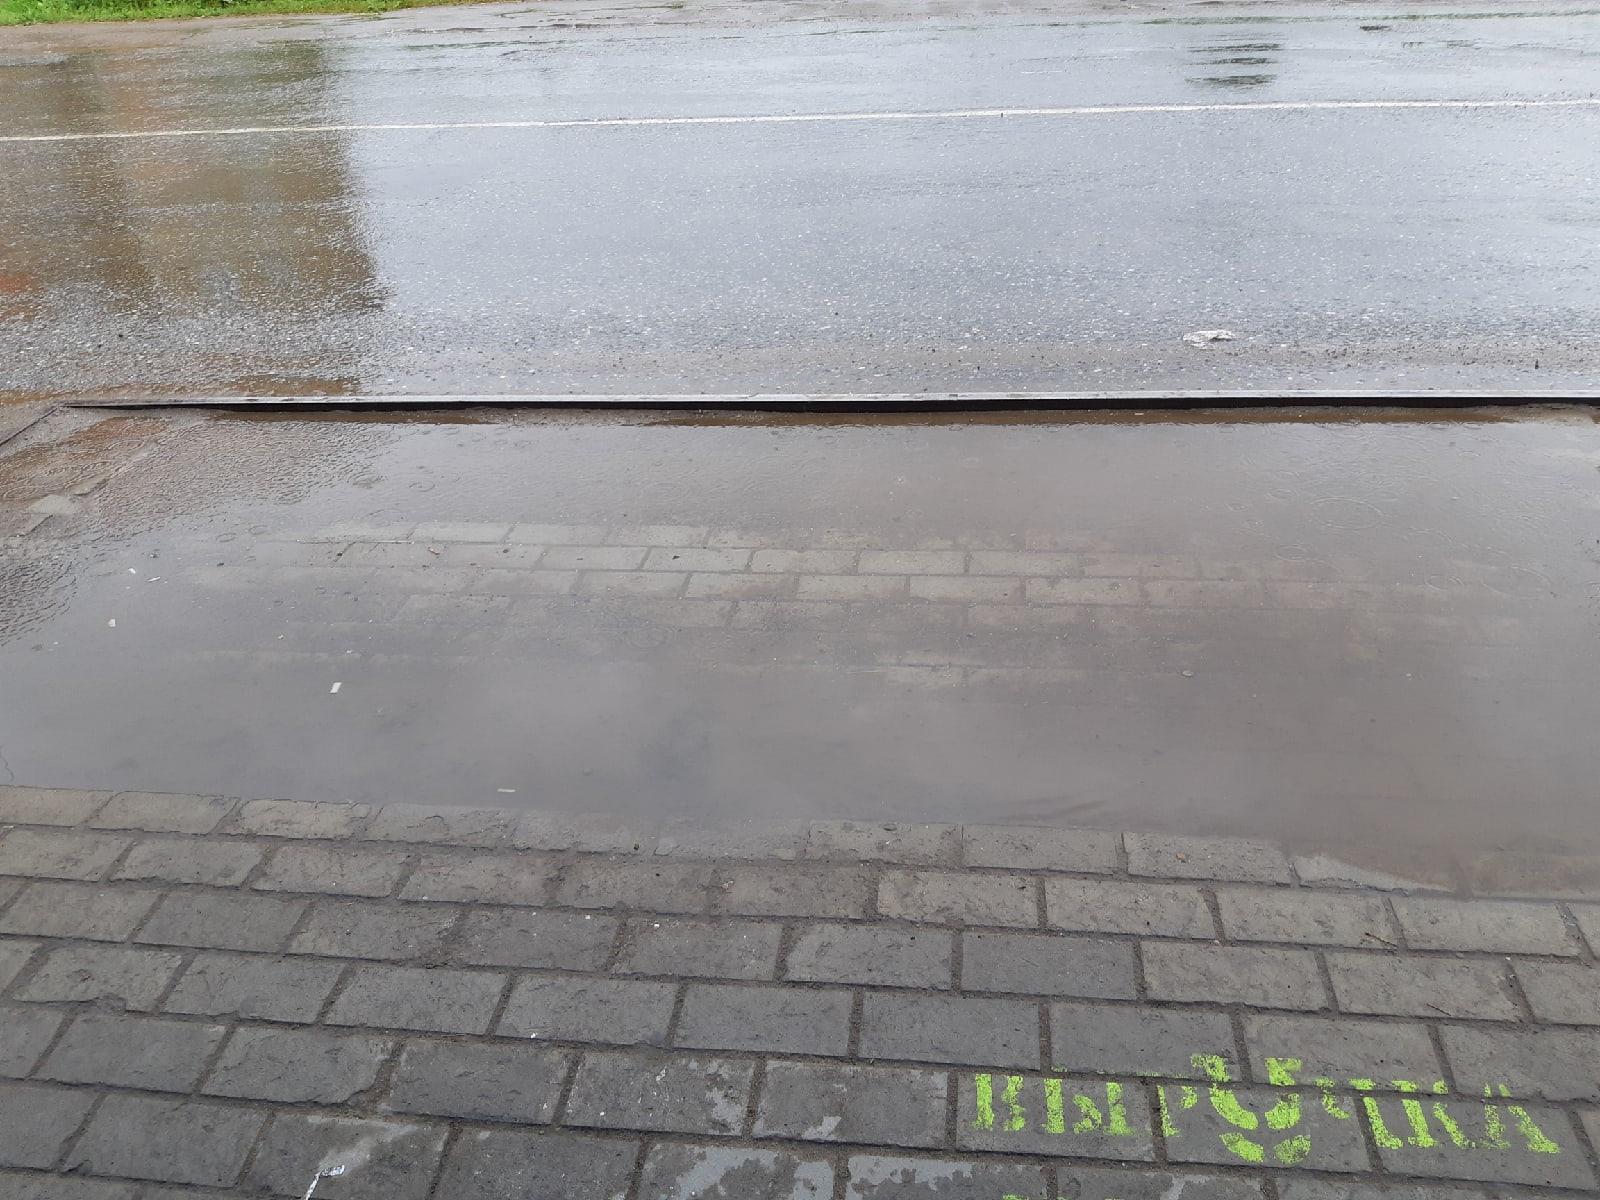 Центр. Во время и после дождя не